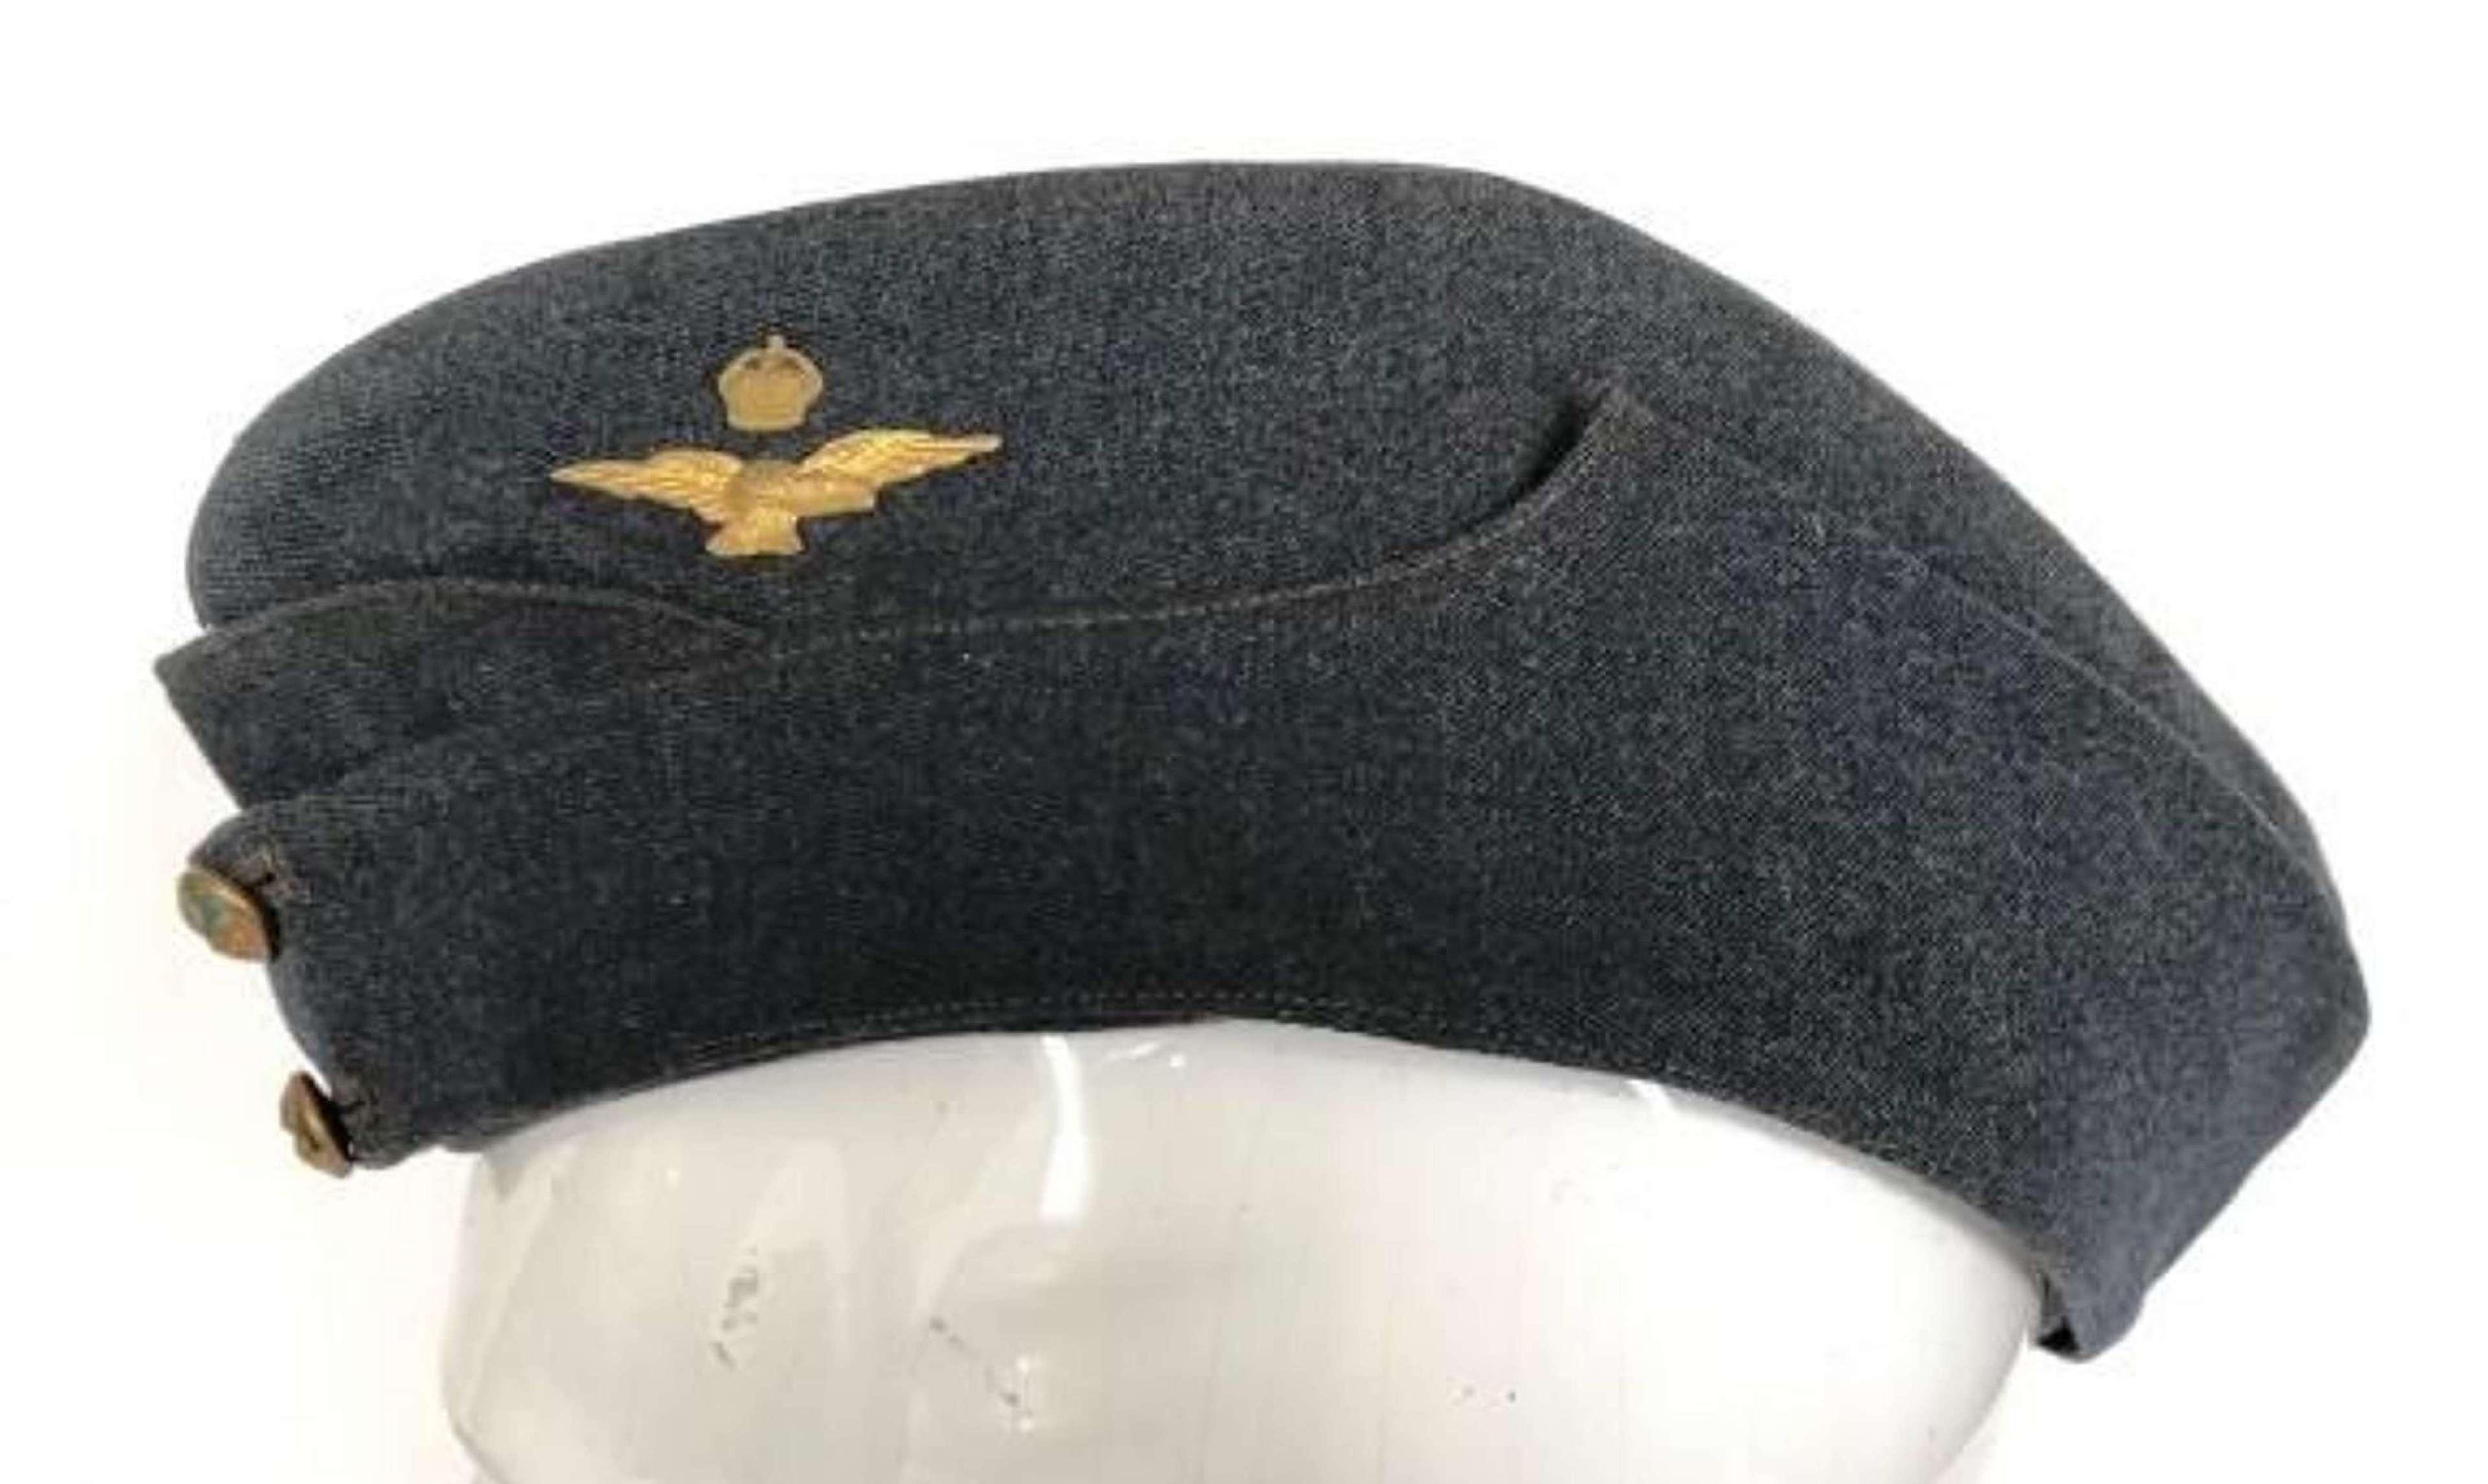 RAF Inter War, Early WW2 Officer's Side Cap.